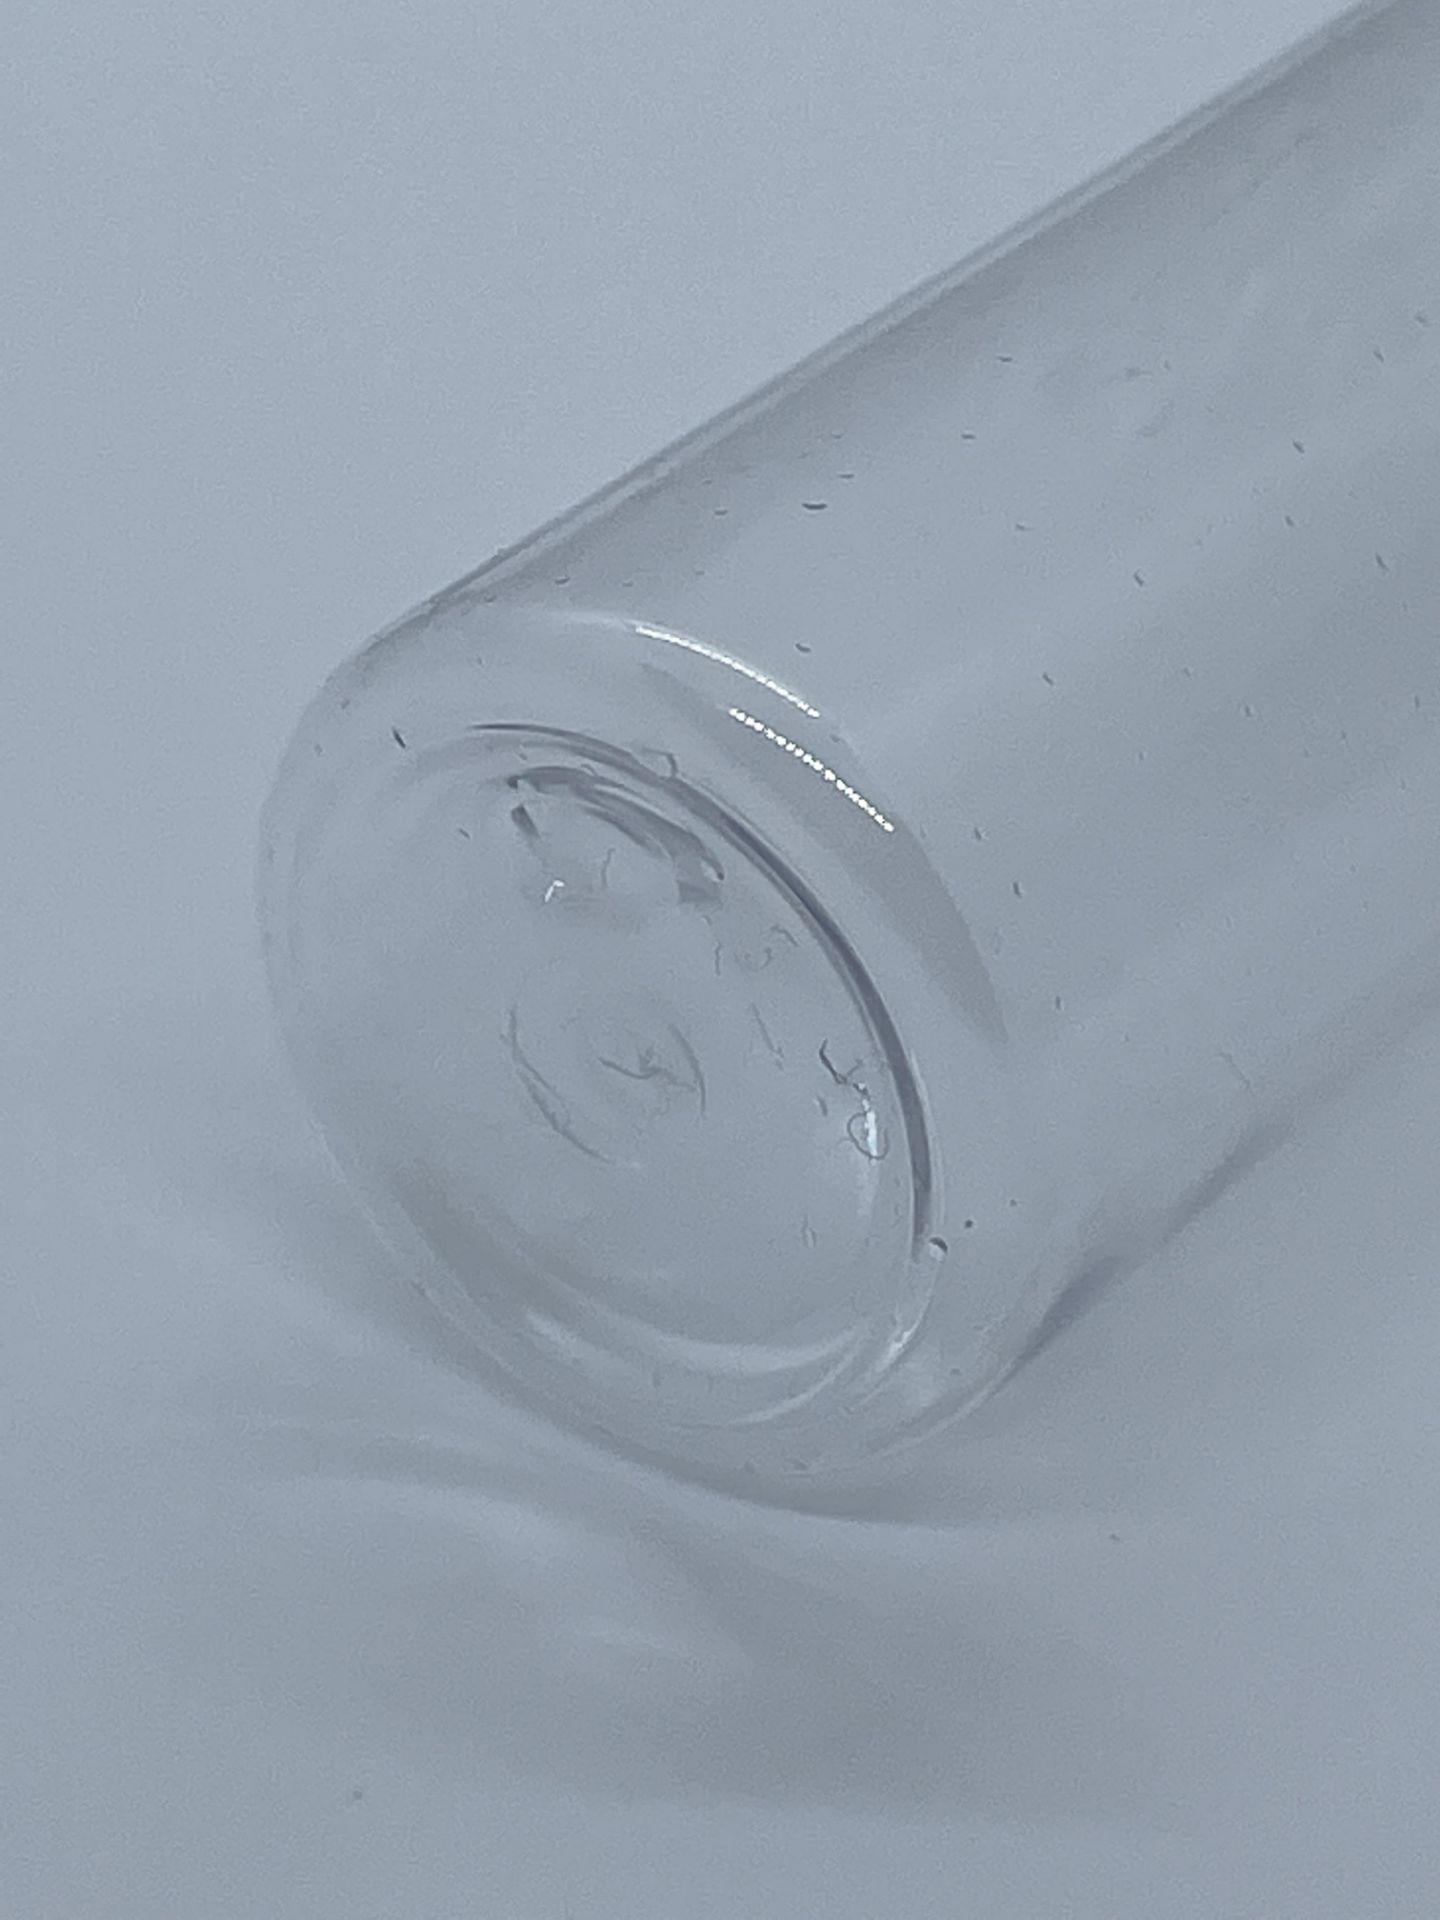 "99,500 - Clear Plastic Bullet 2 oz Empty Bottles, 18-410 Threading Neck, 4.25"" Tall 1.25"" Diameter - Image 5 of 5"